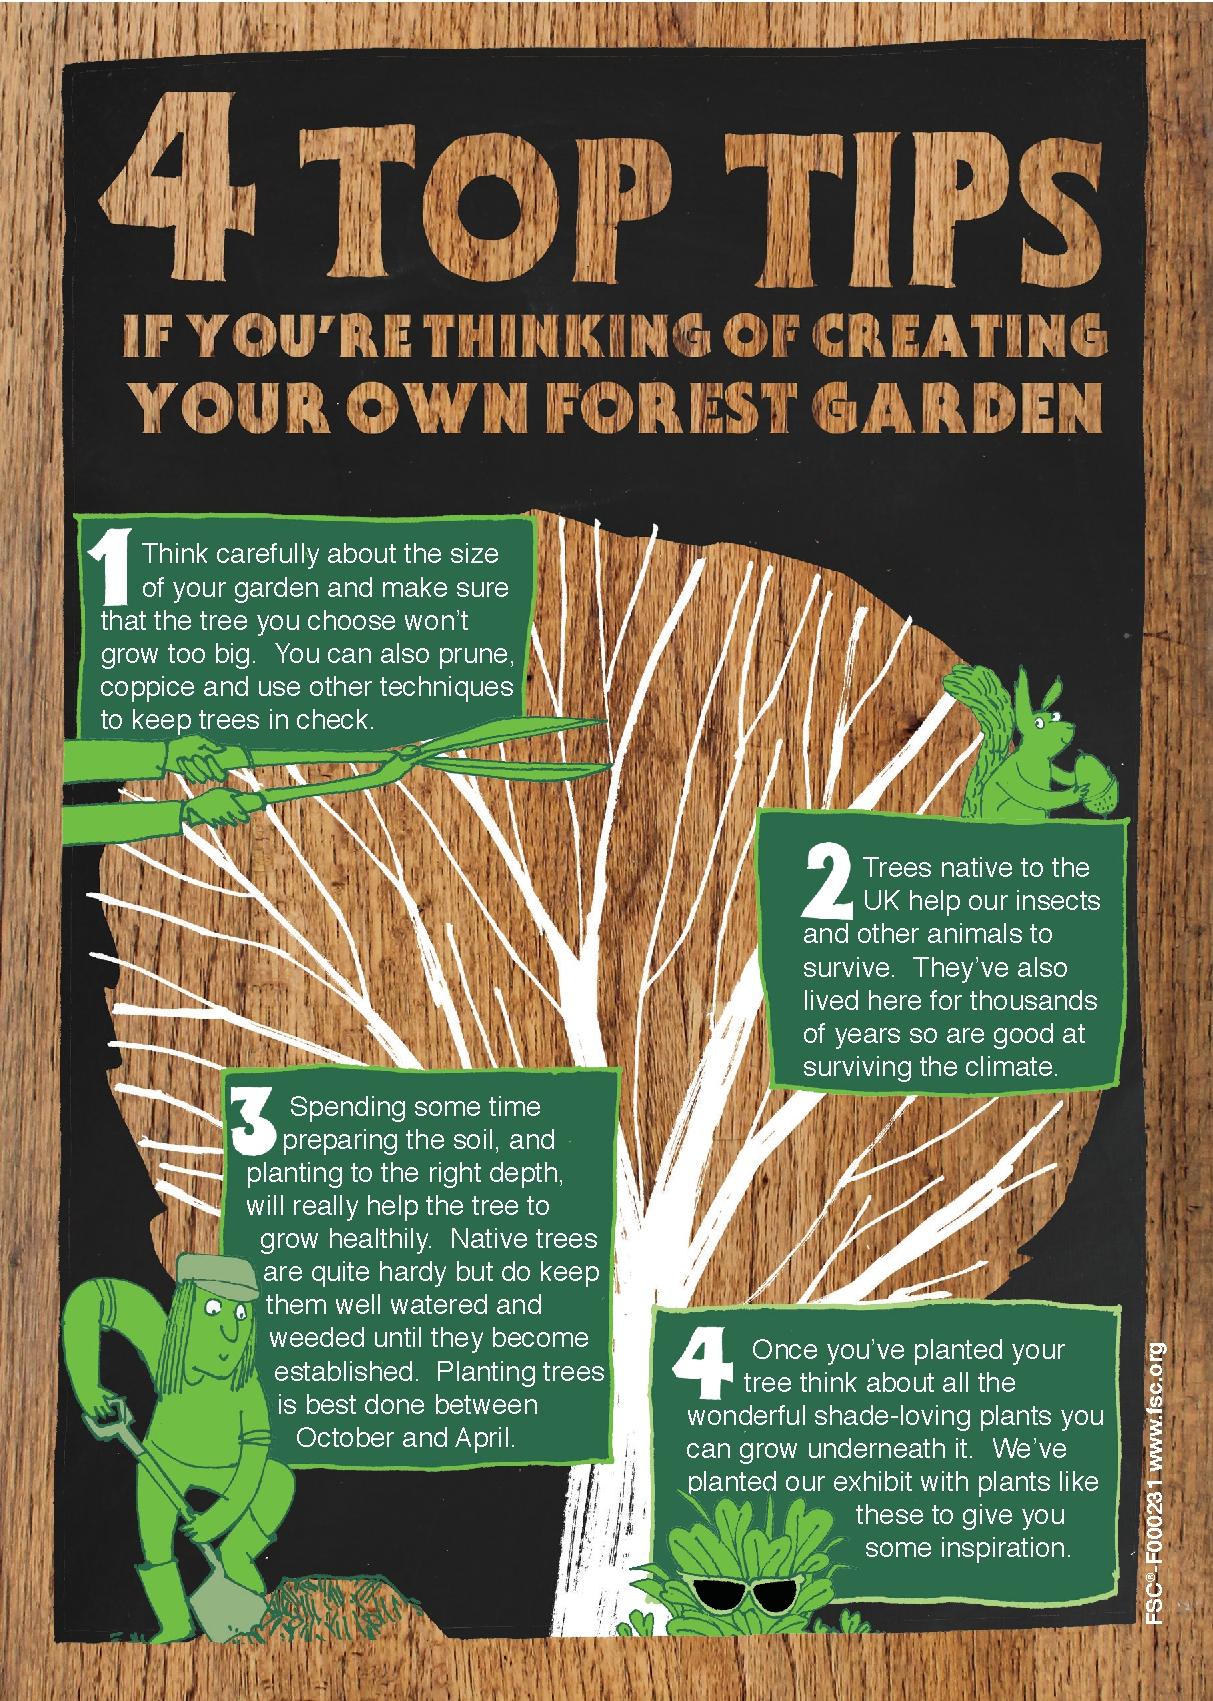 The Forest in your garden - kirstidavies.com